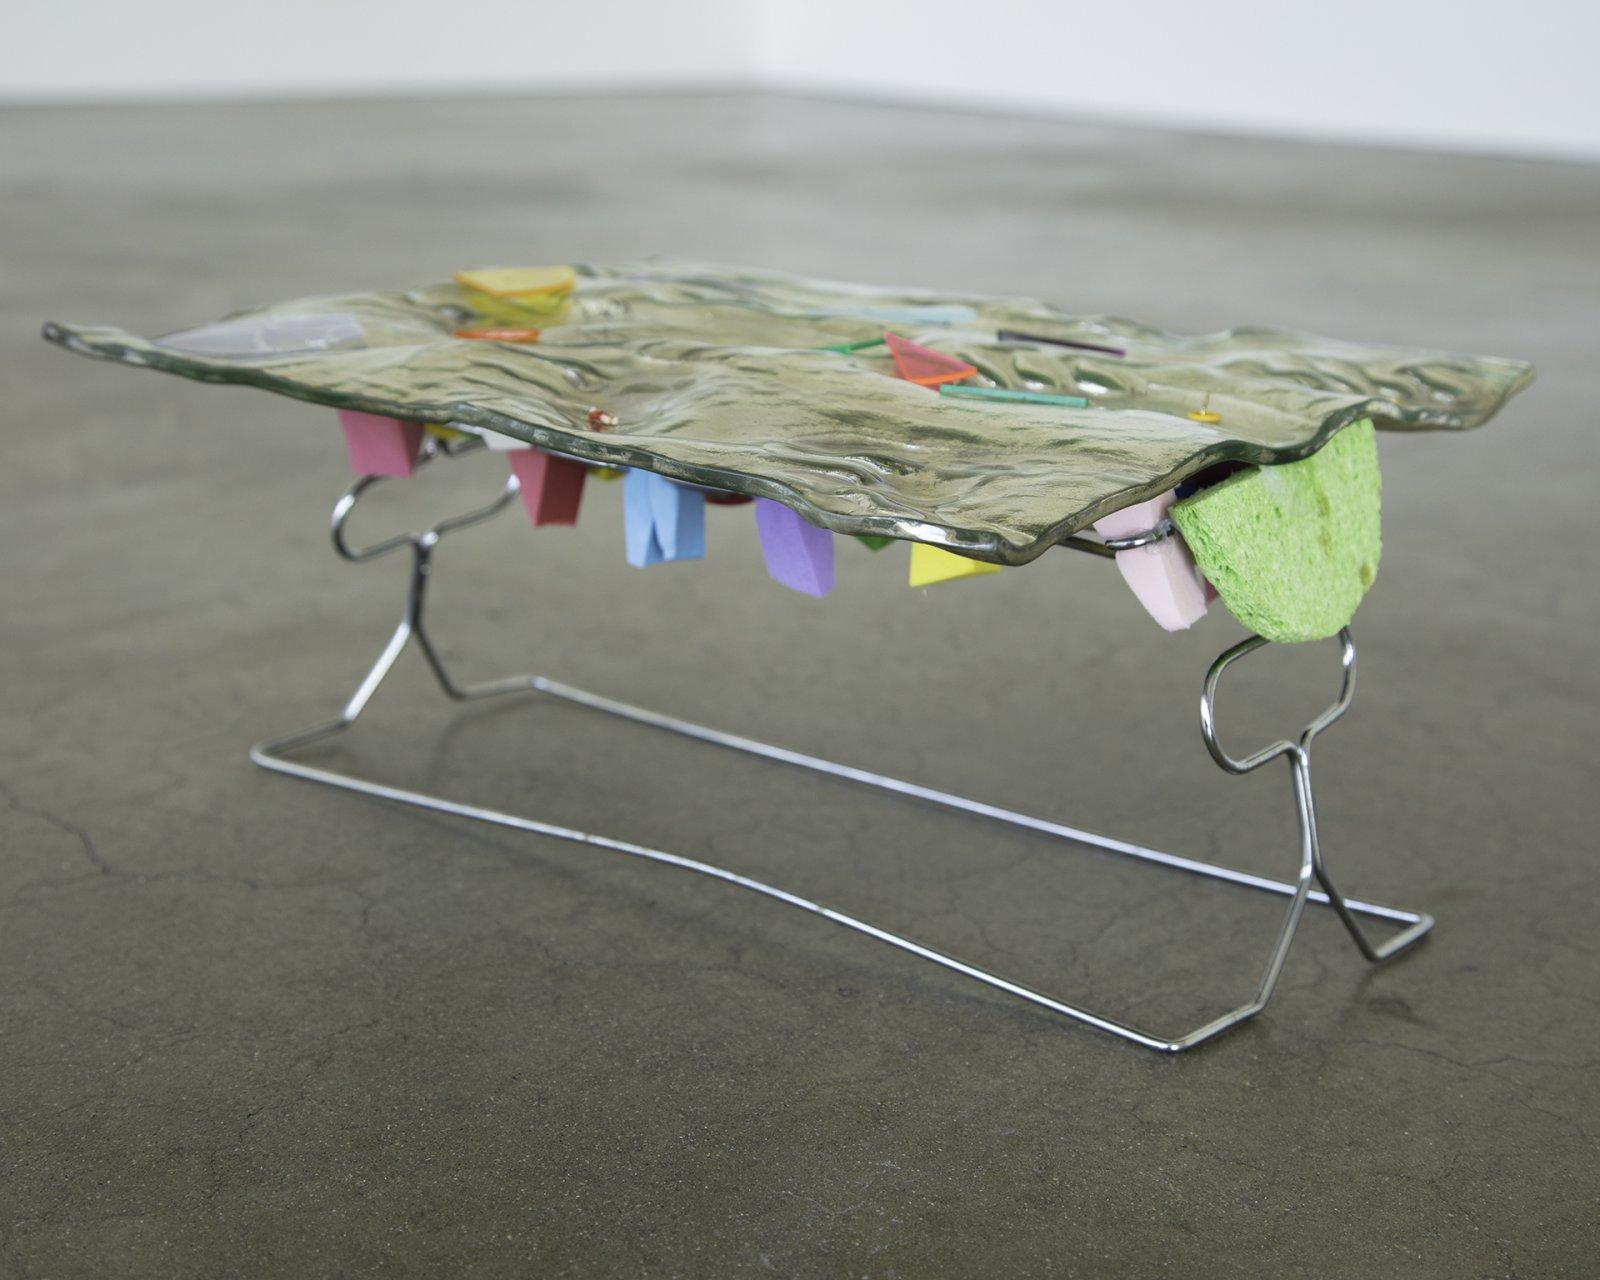 Julia Feyrer,New Pedestrians, 2017,silvered glass, sponges, metal rack, dimensions variable